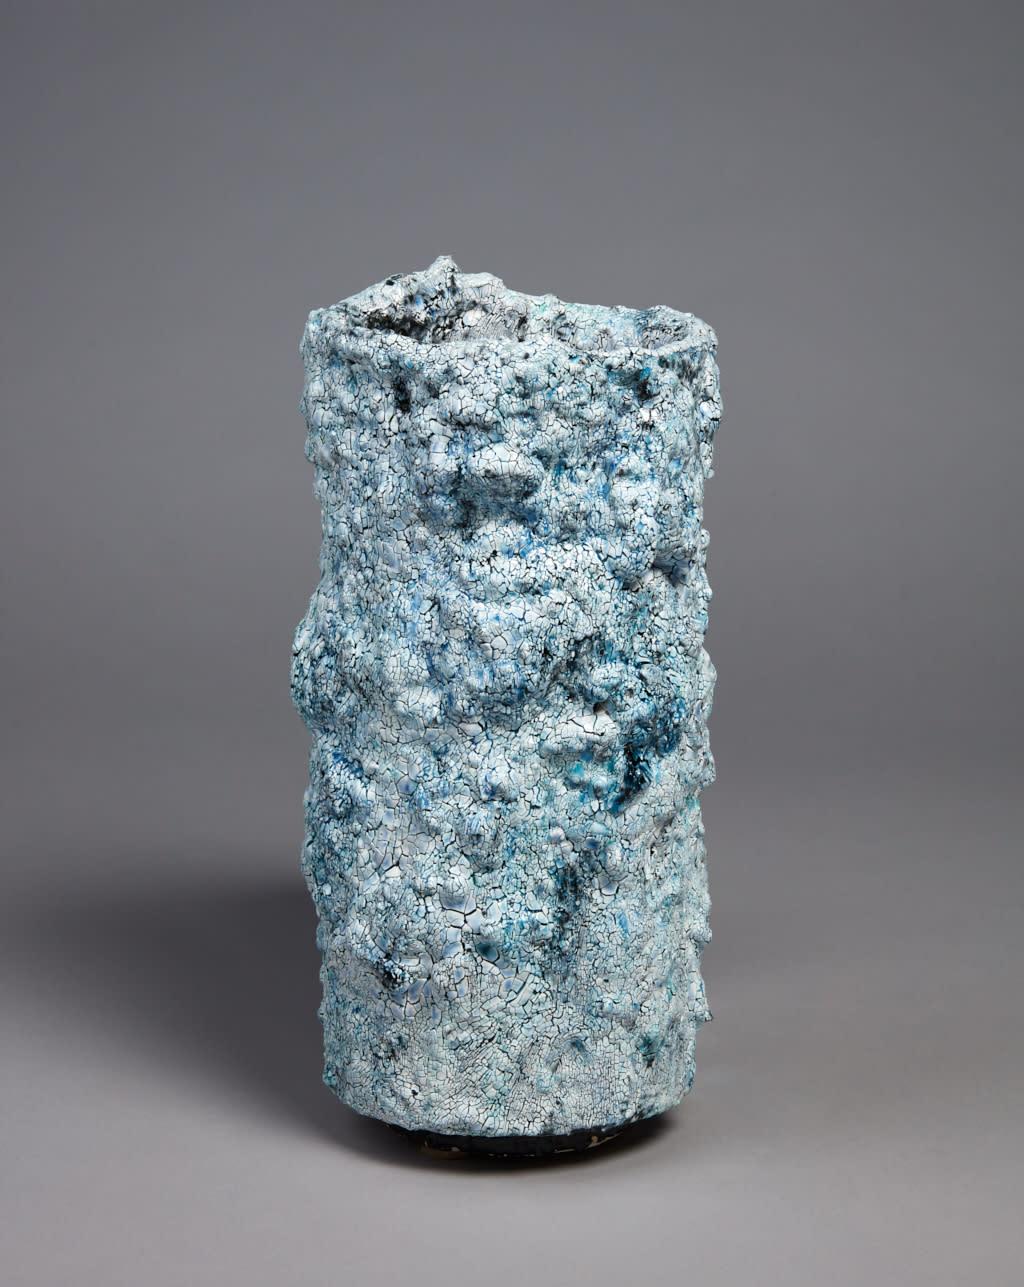 Tony Marsh, Cauldron #24, 2018 multiple fired clay, glaze 15 x 9 inches